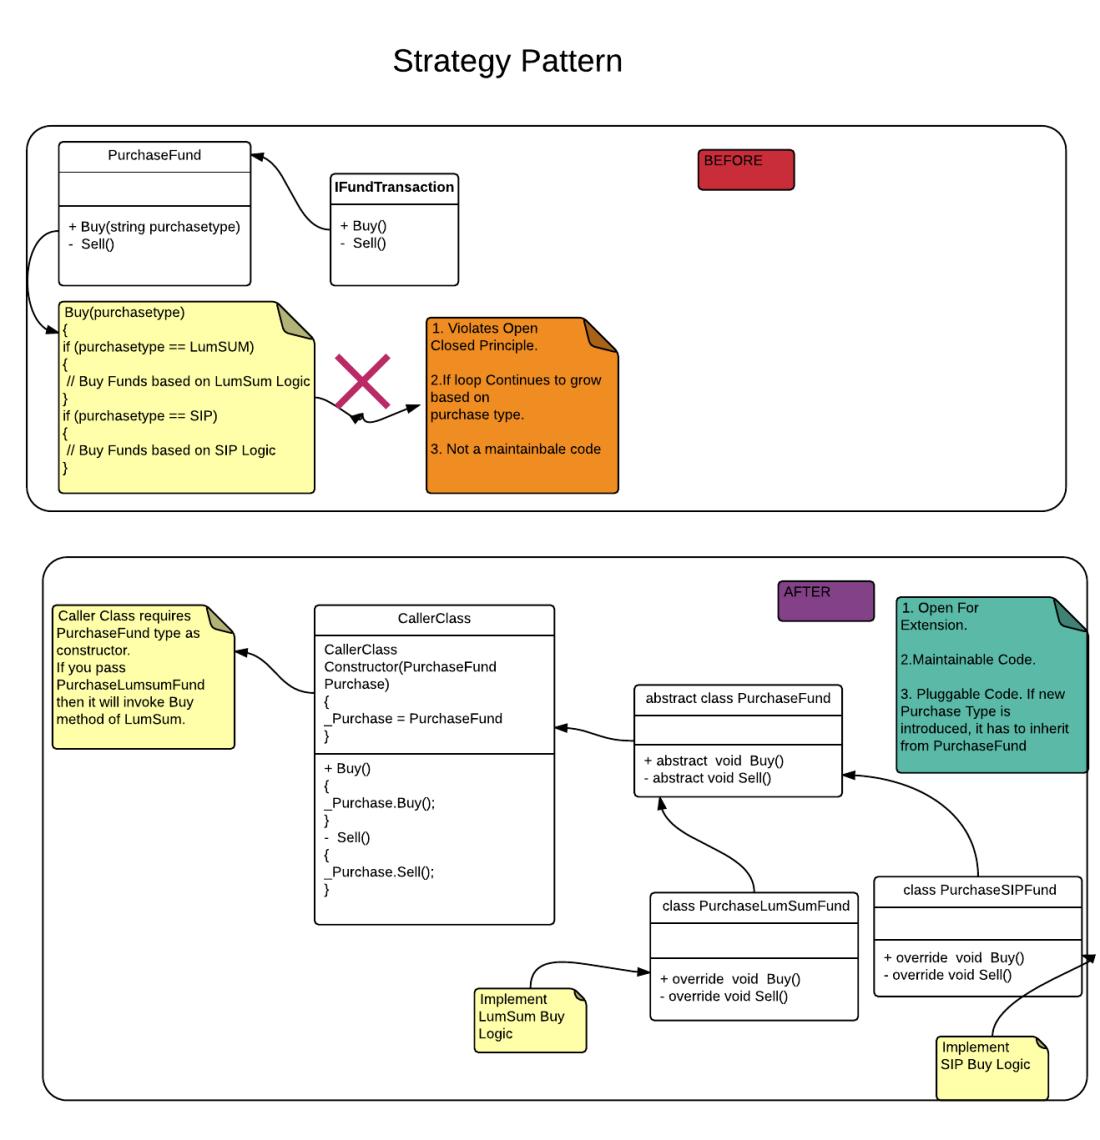 StartergyPattern - New Page